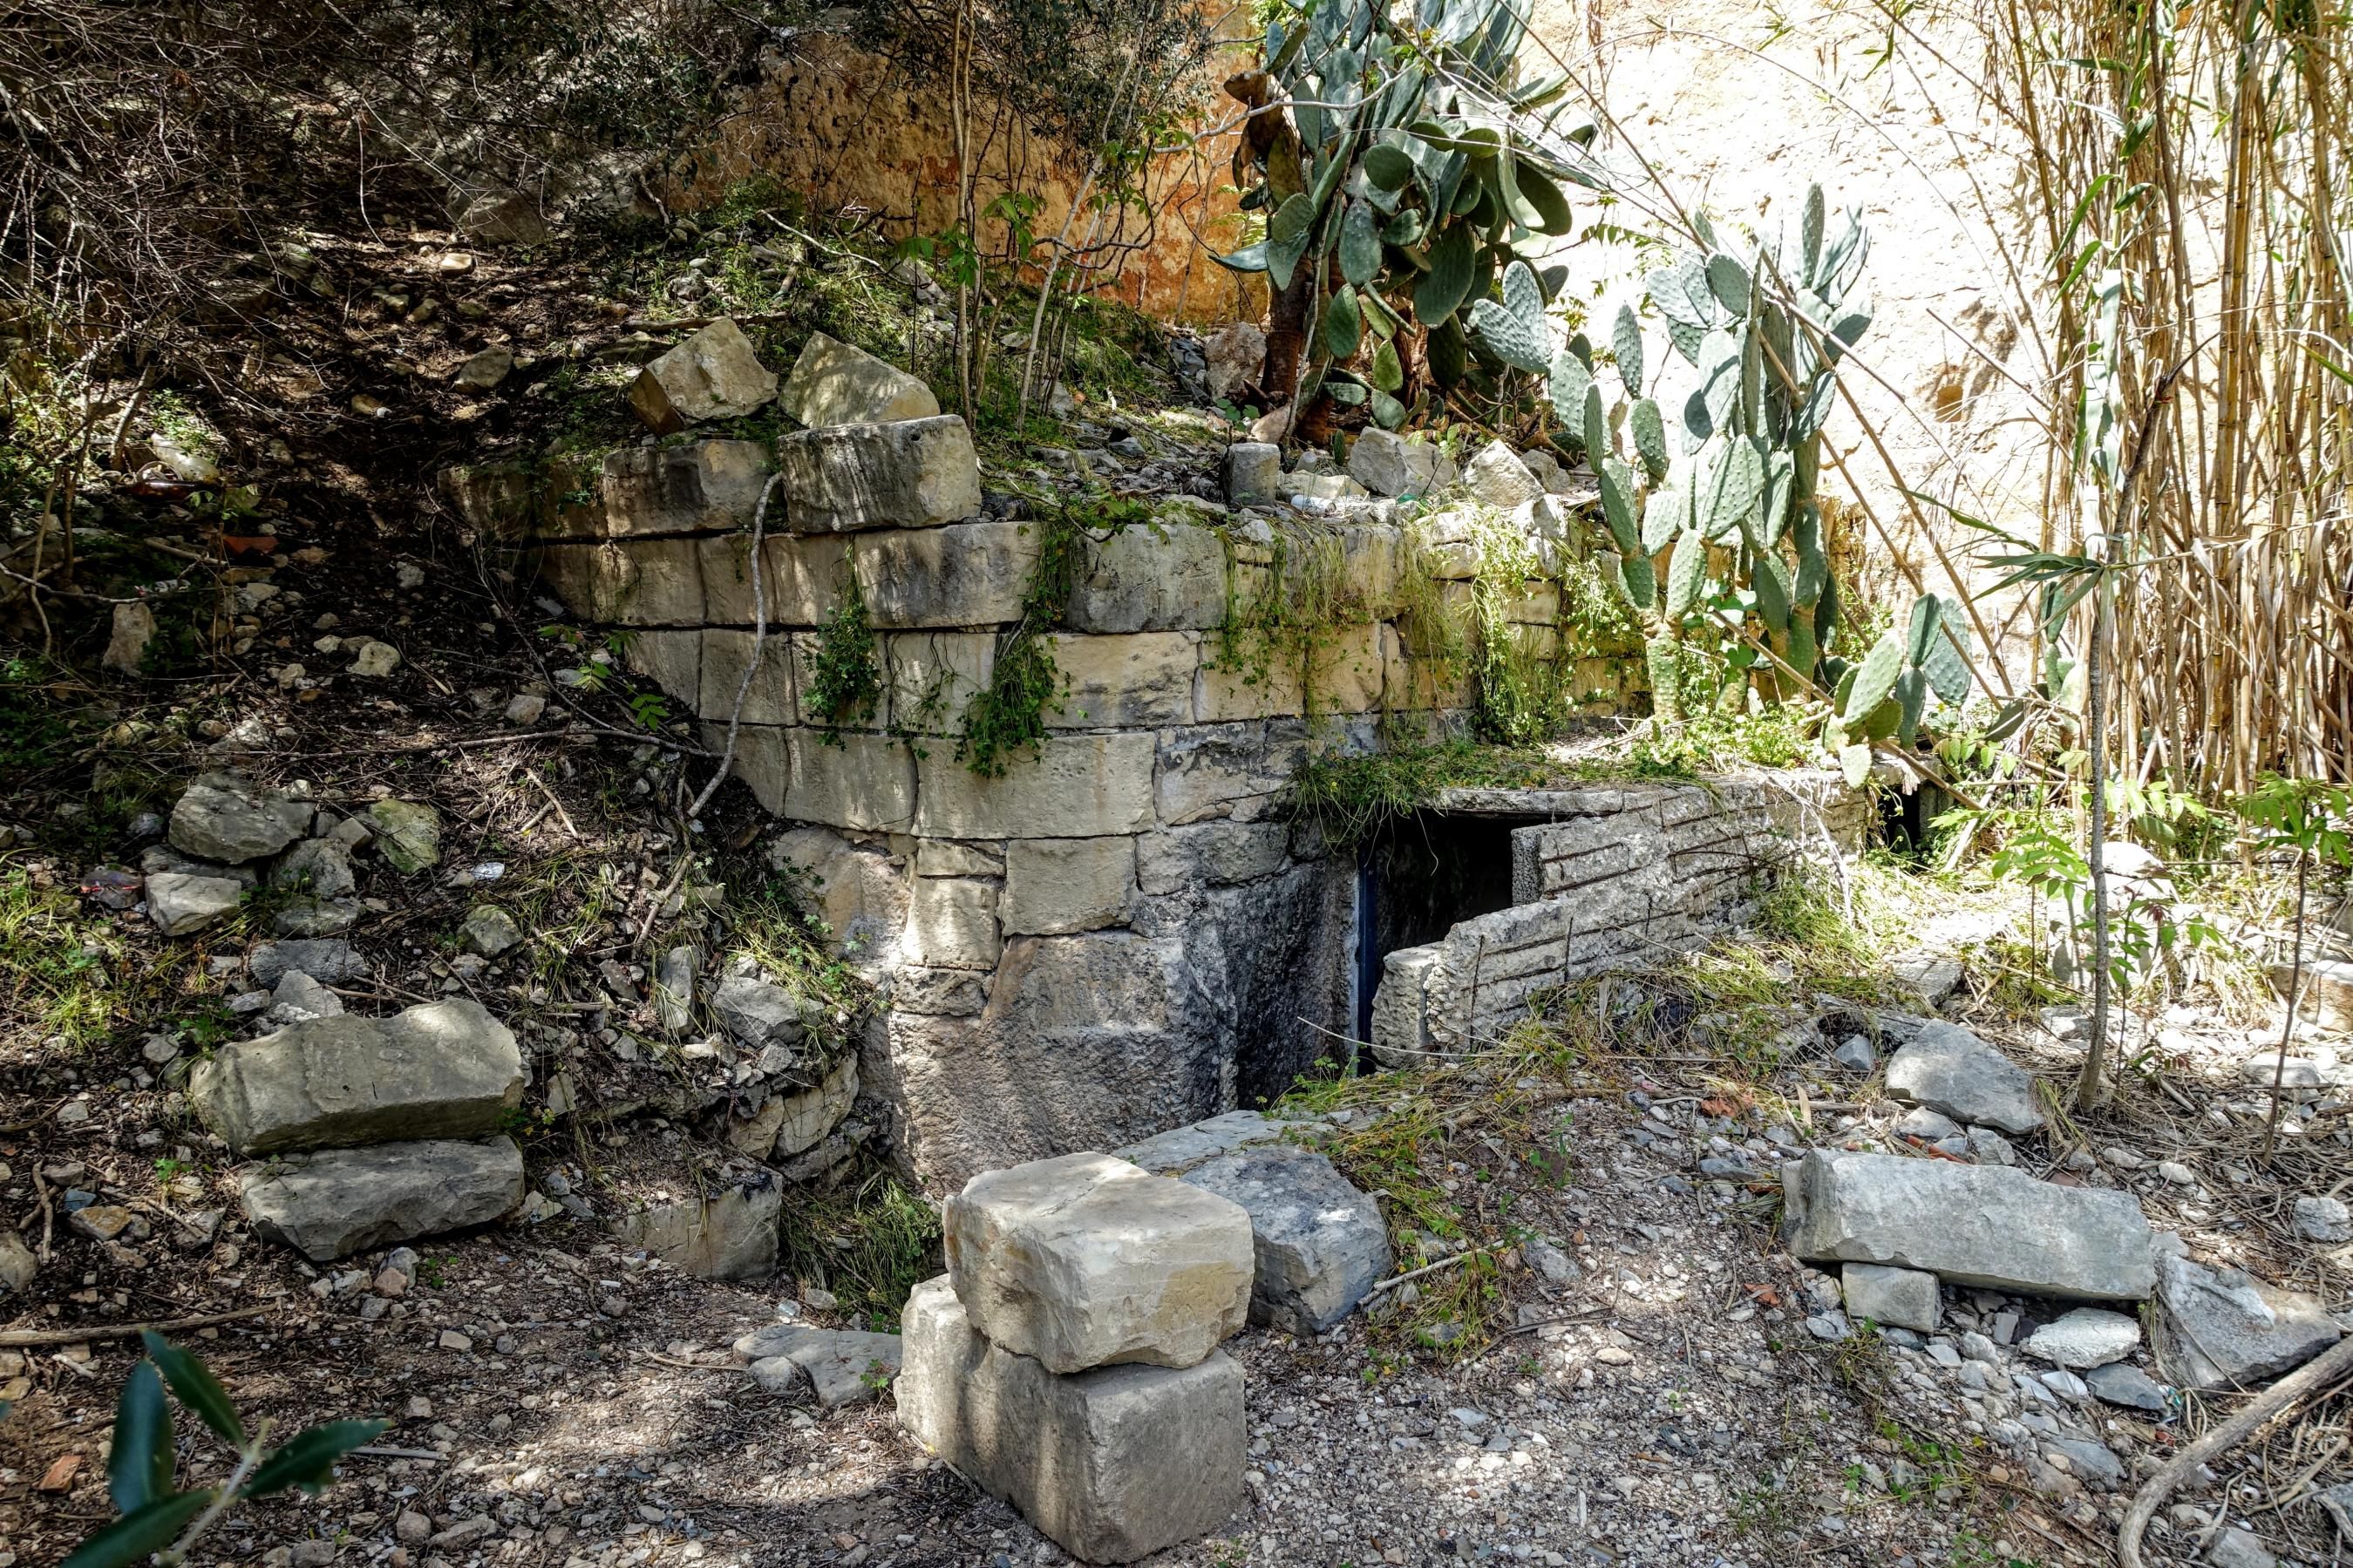 Harq Hamiem Cave entrance [Sven Midensol]